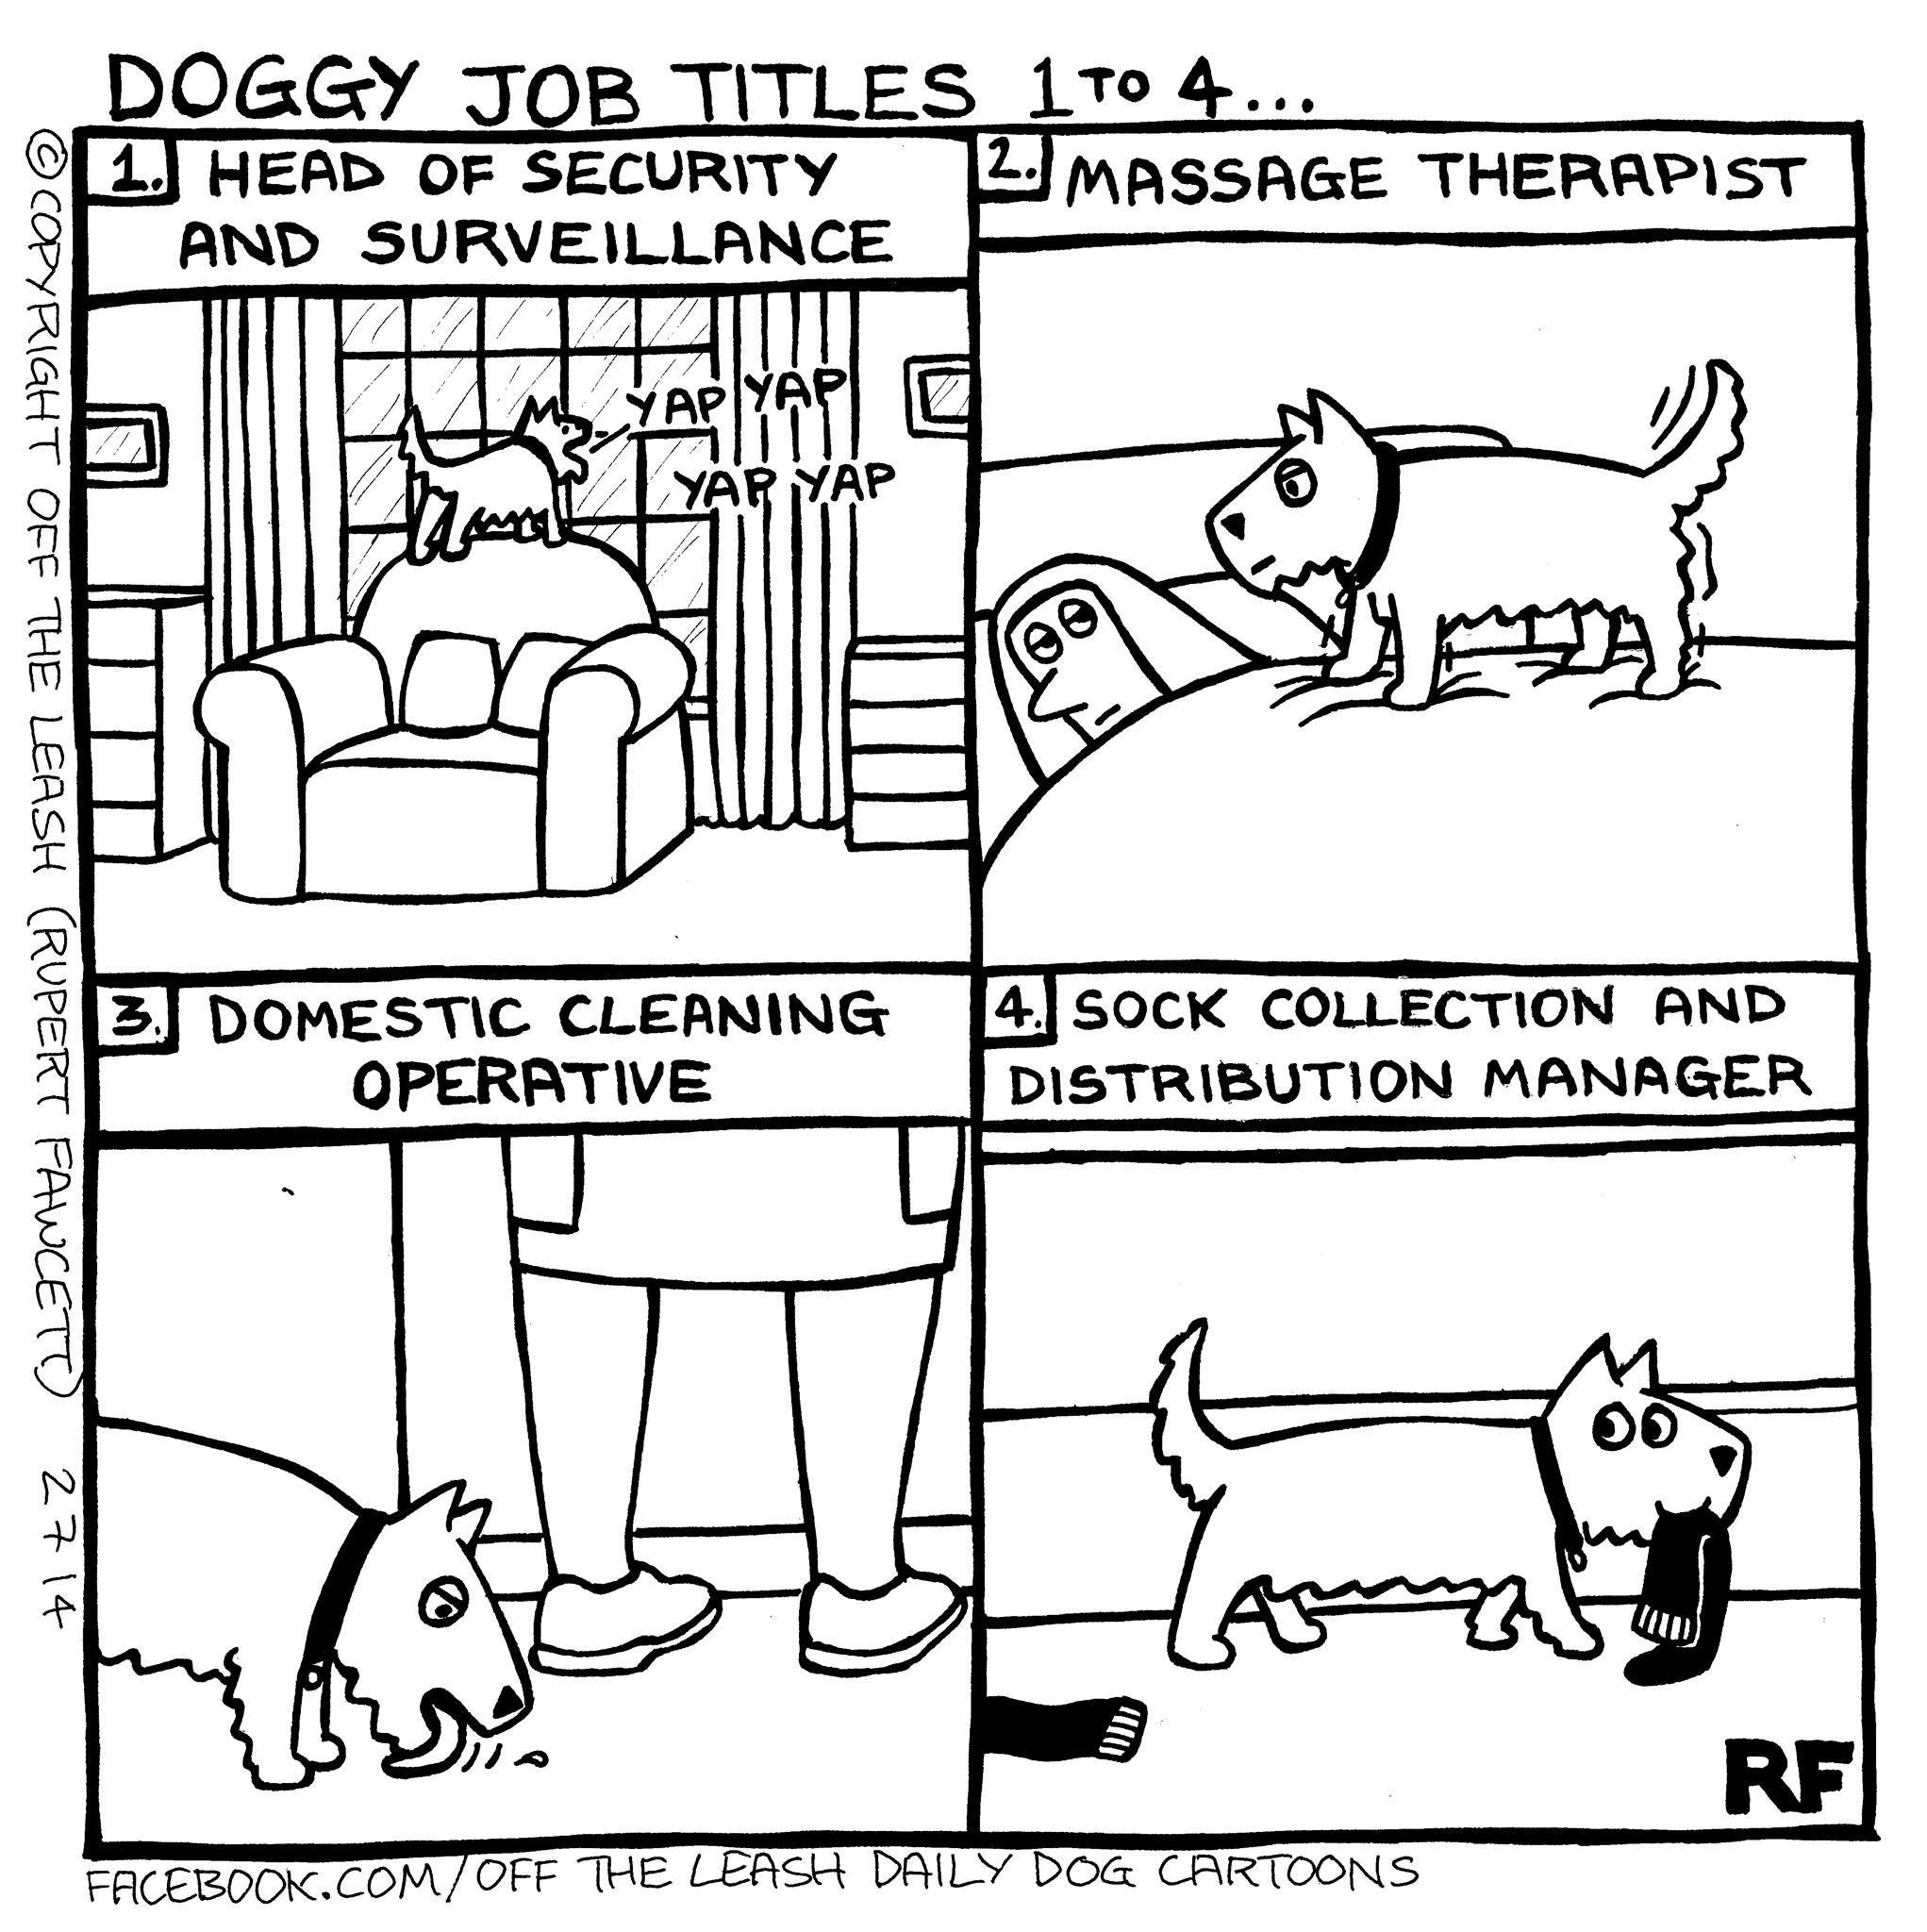 Pin By Judith Finehirsh On Chuckles Cartoon Dog Dog Comics Dog Jokes